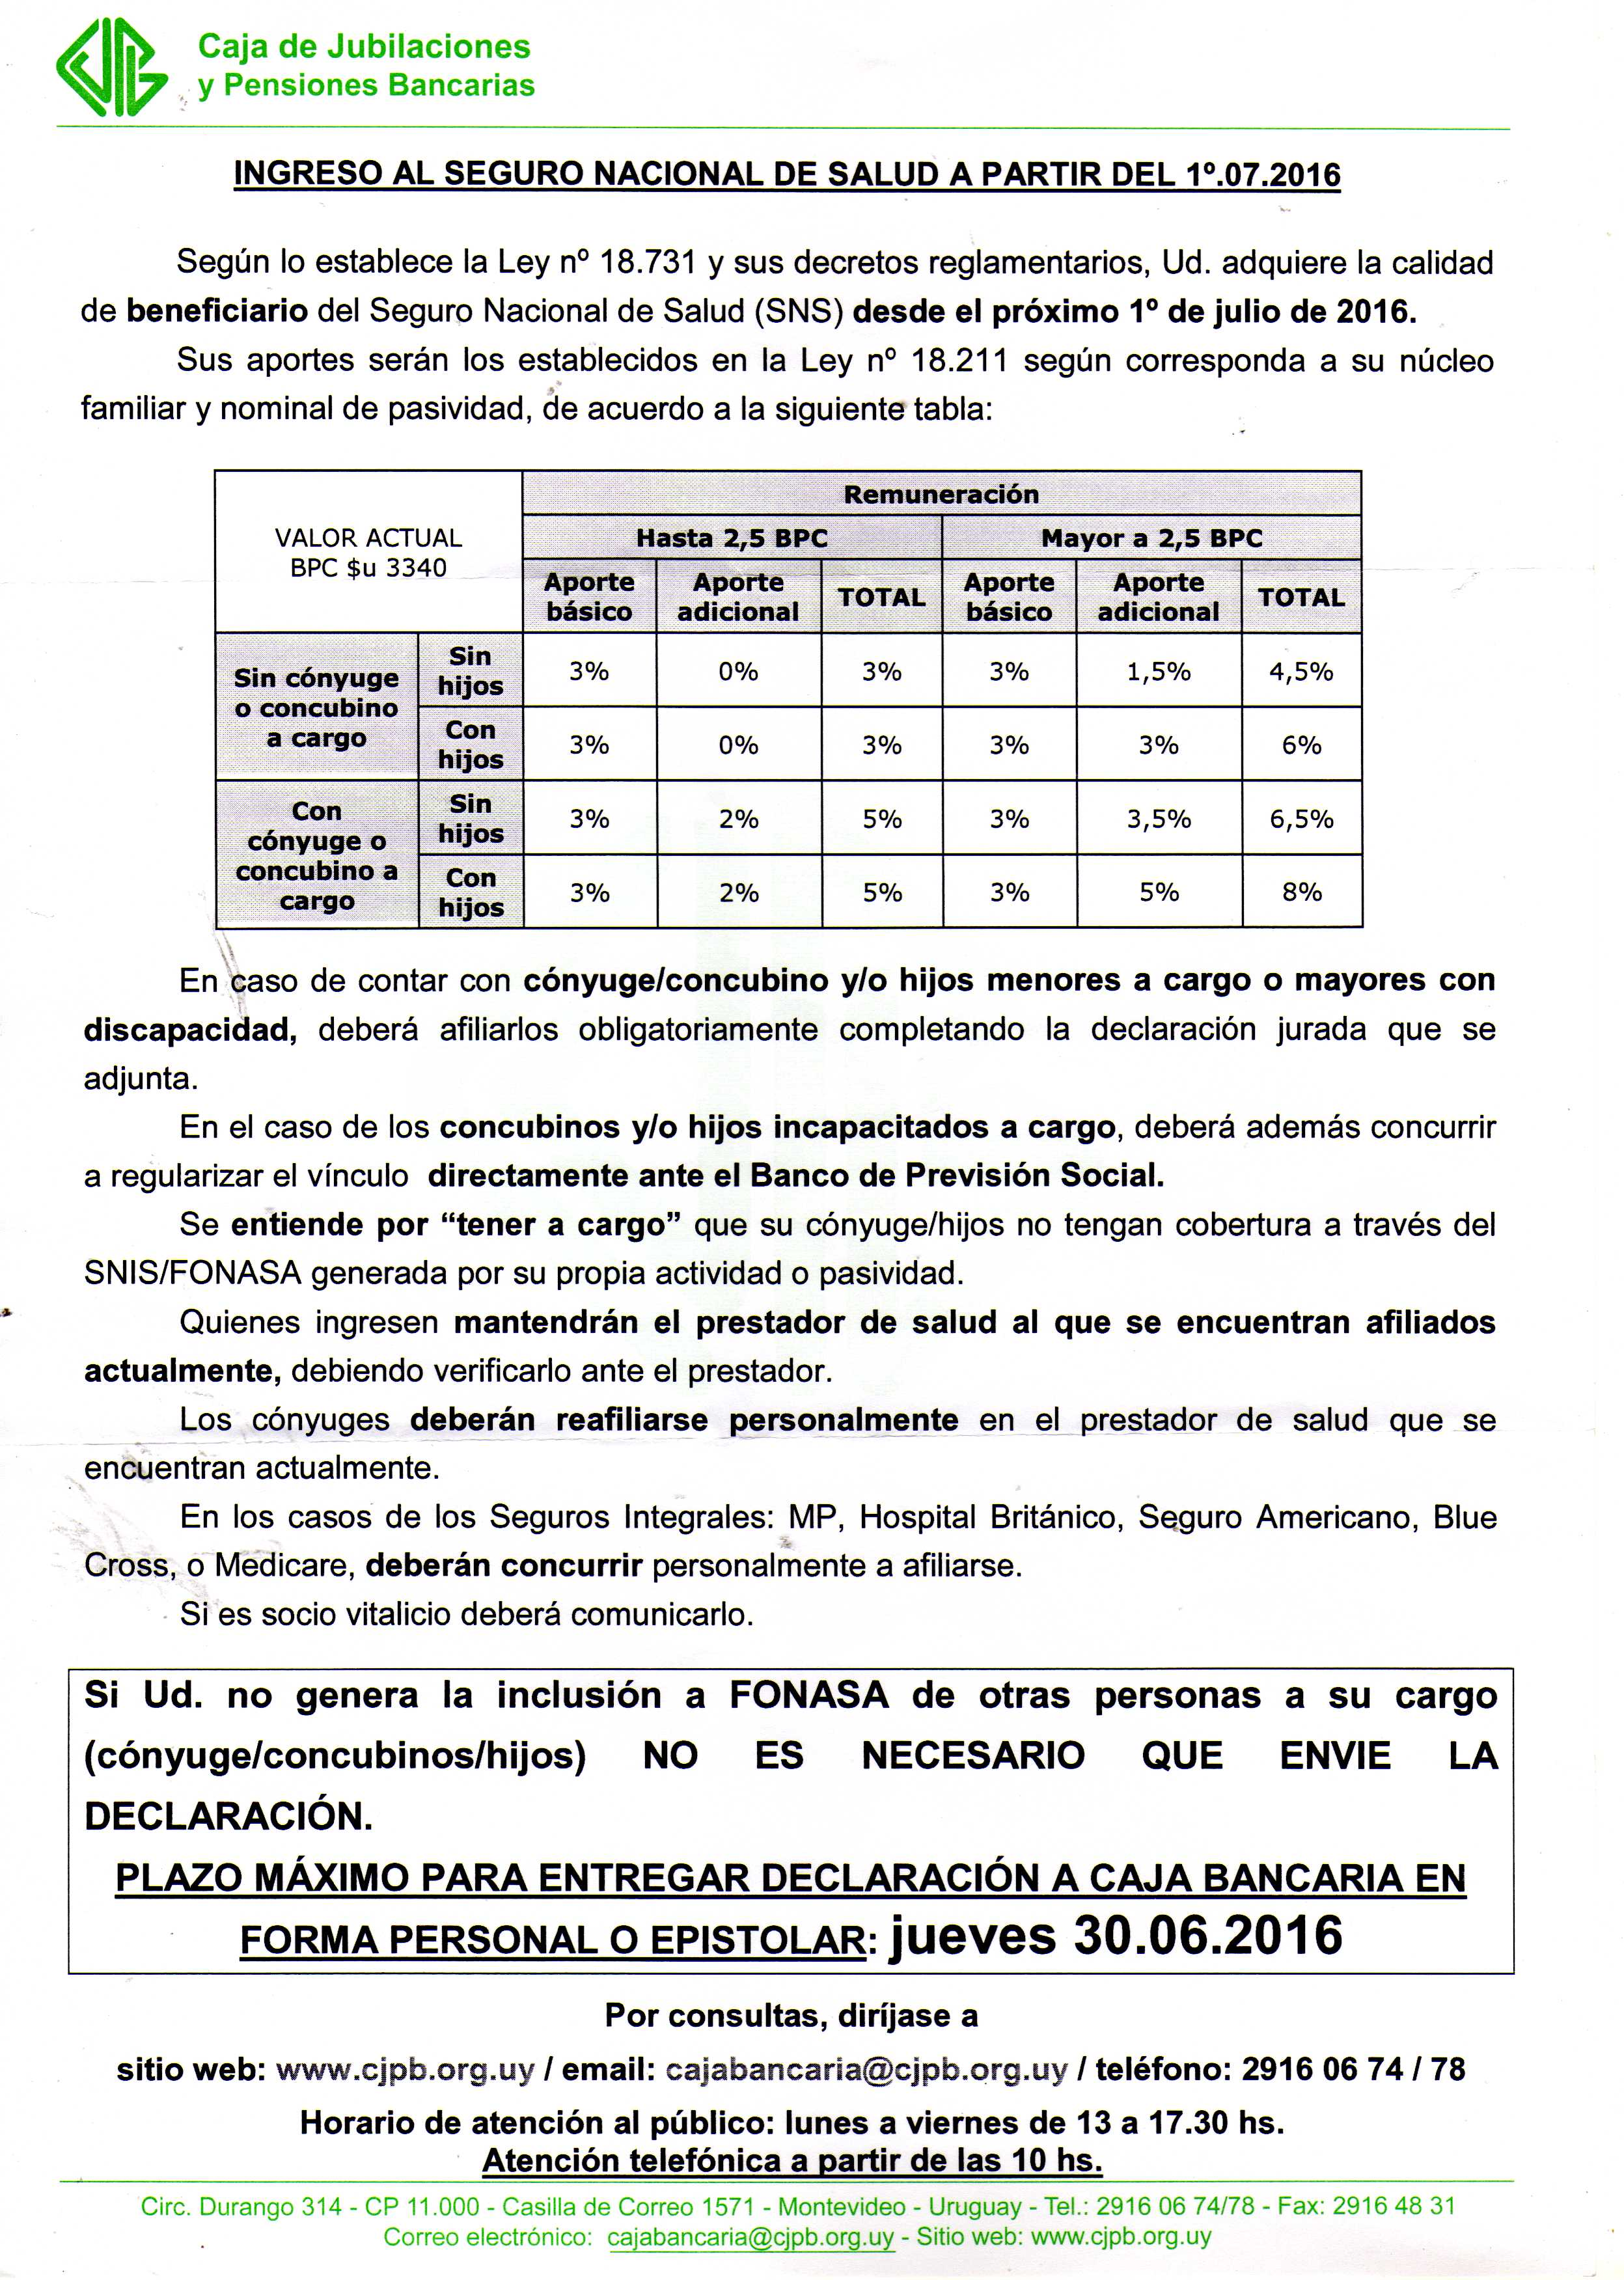 CUADRO DE FONASA